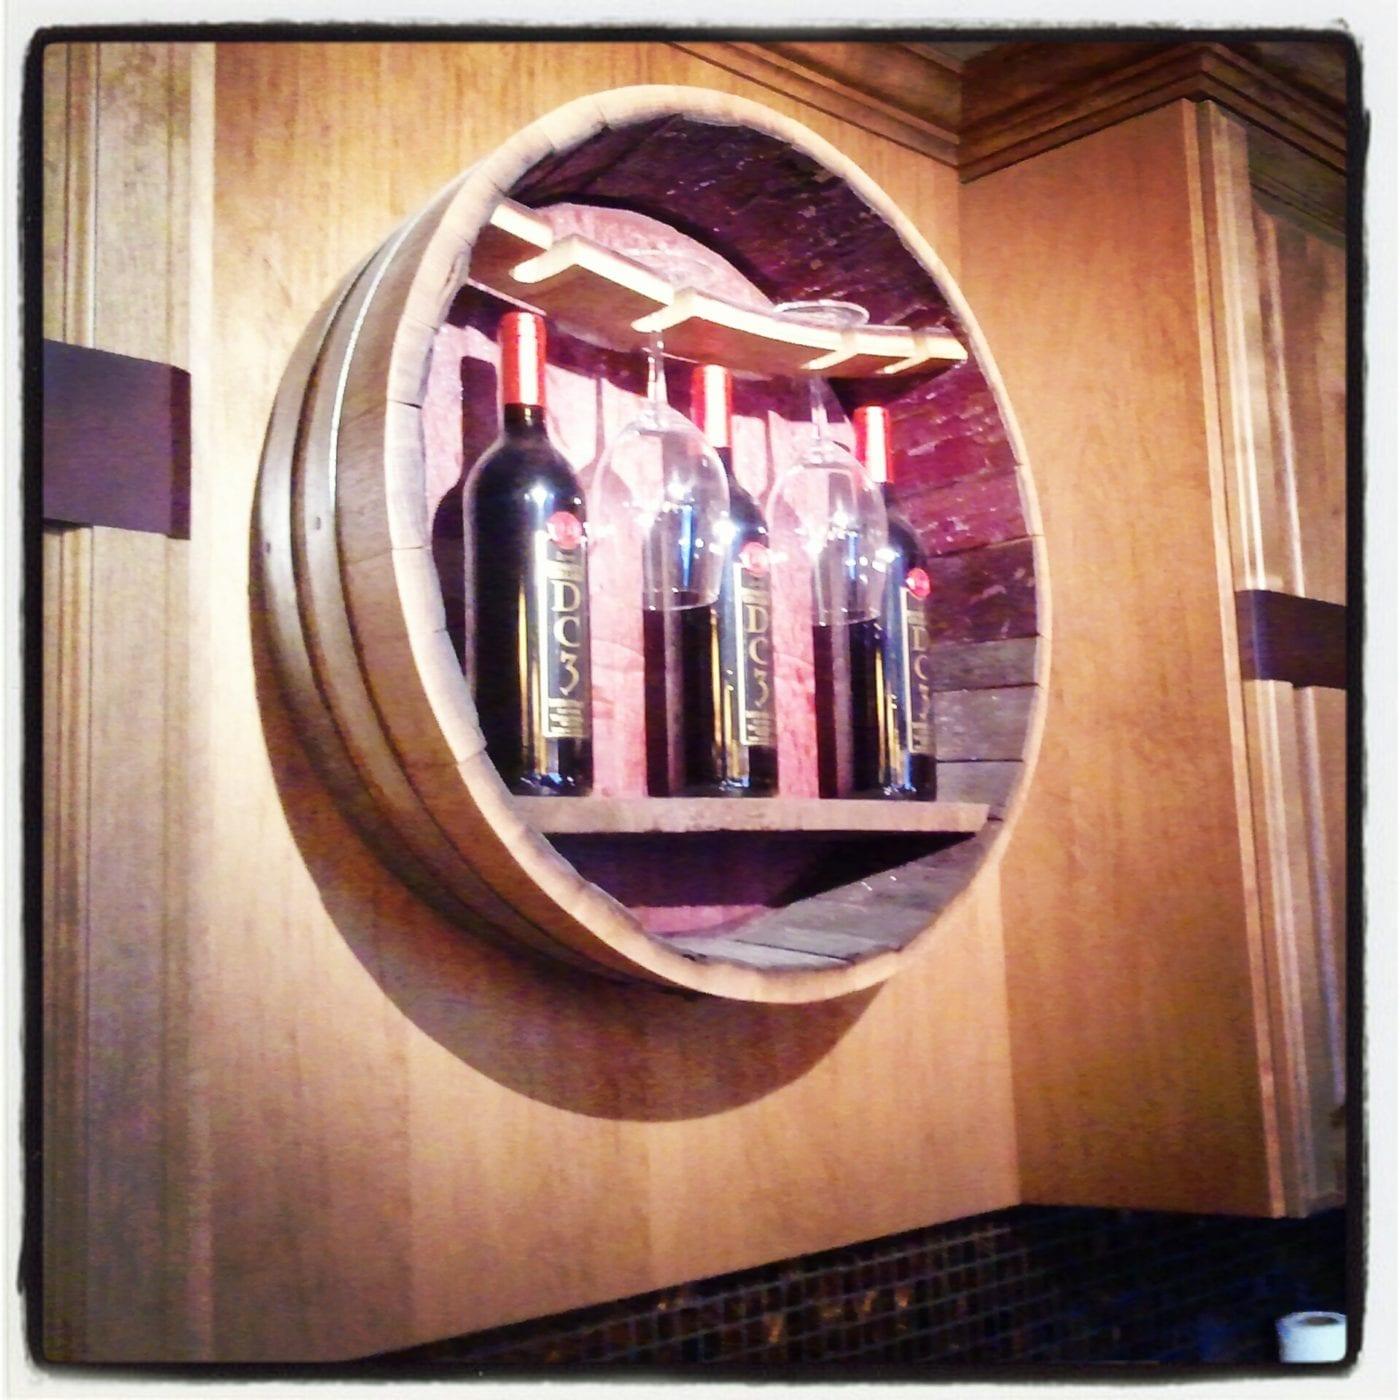 Dynasty Cellars Winery, Whatcom Wine